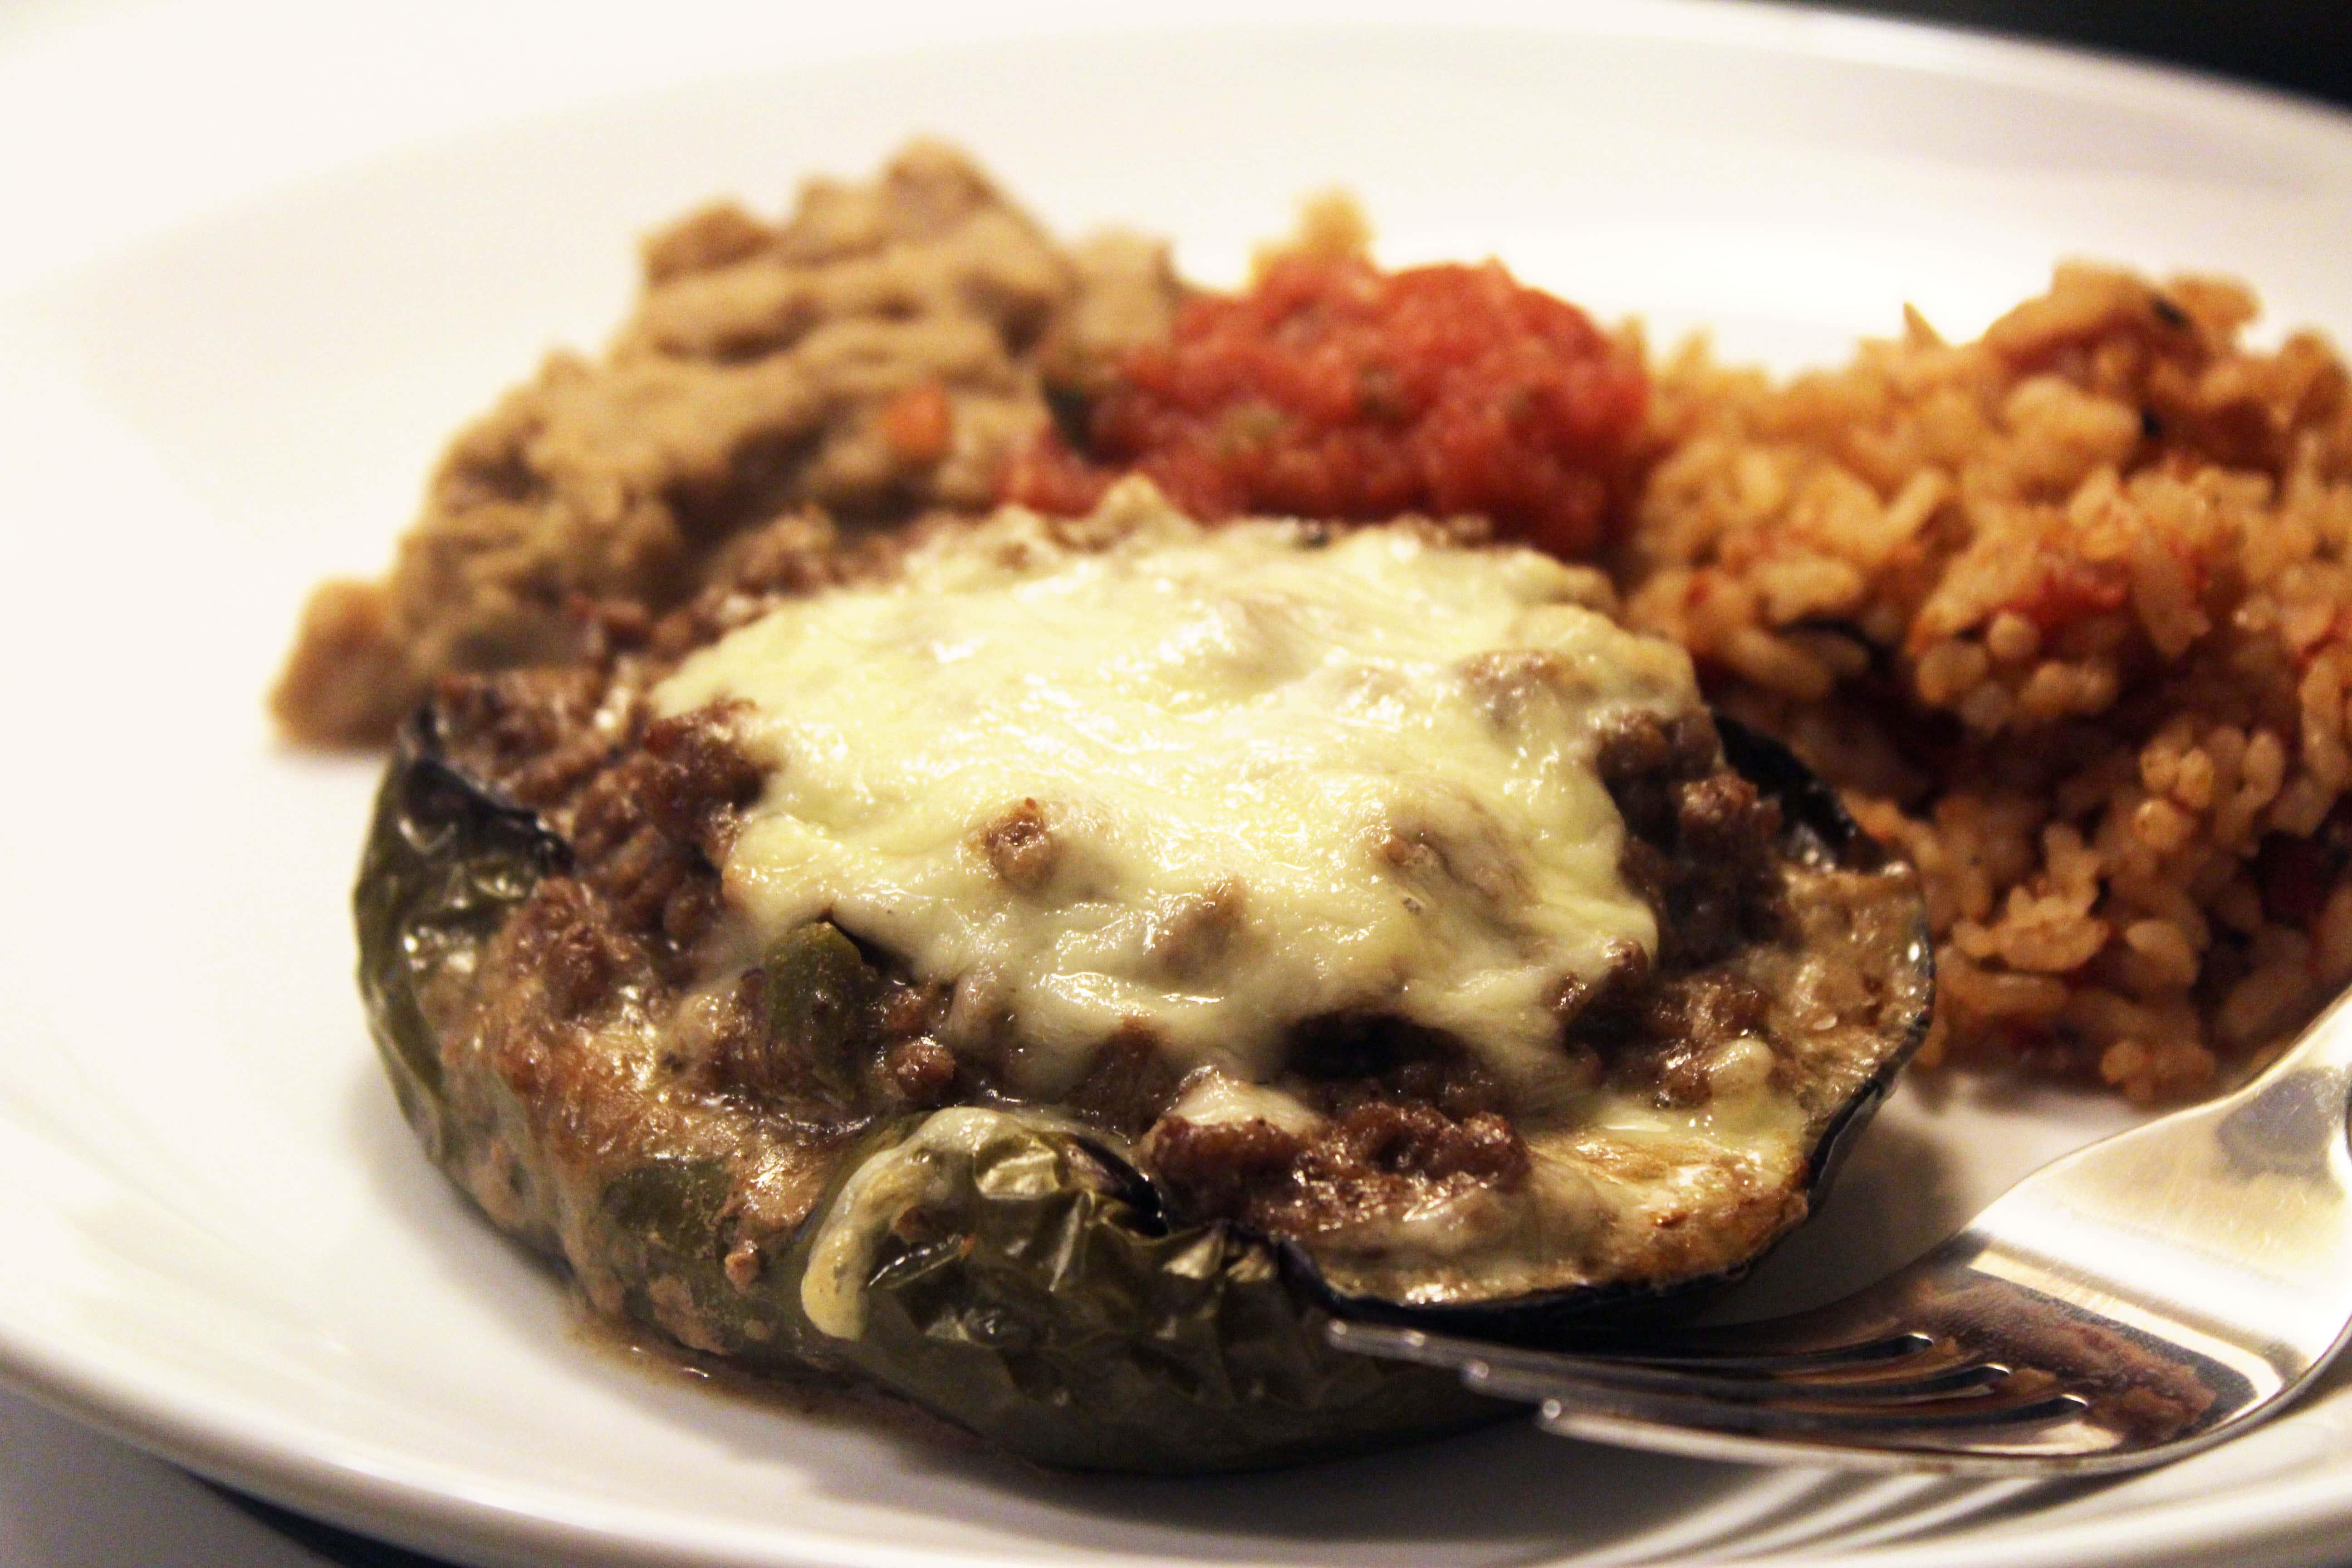 Chile Relleno, Restaurant-style